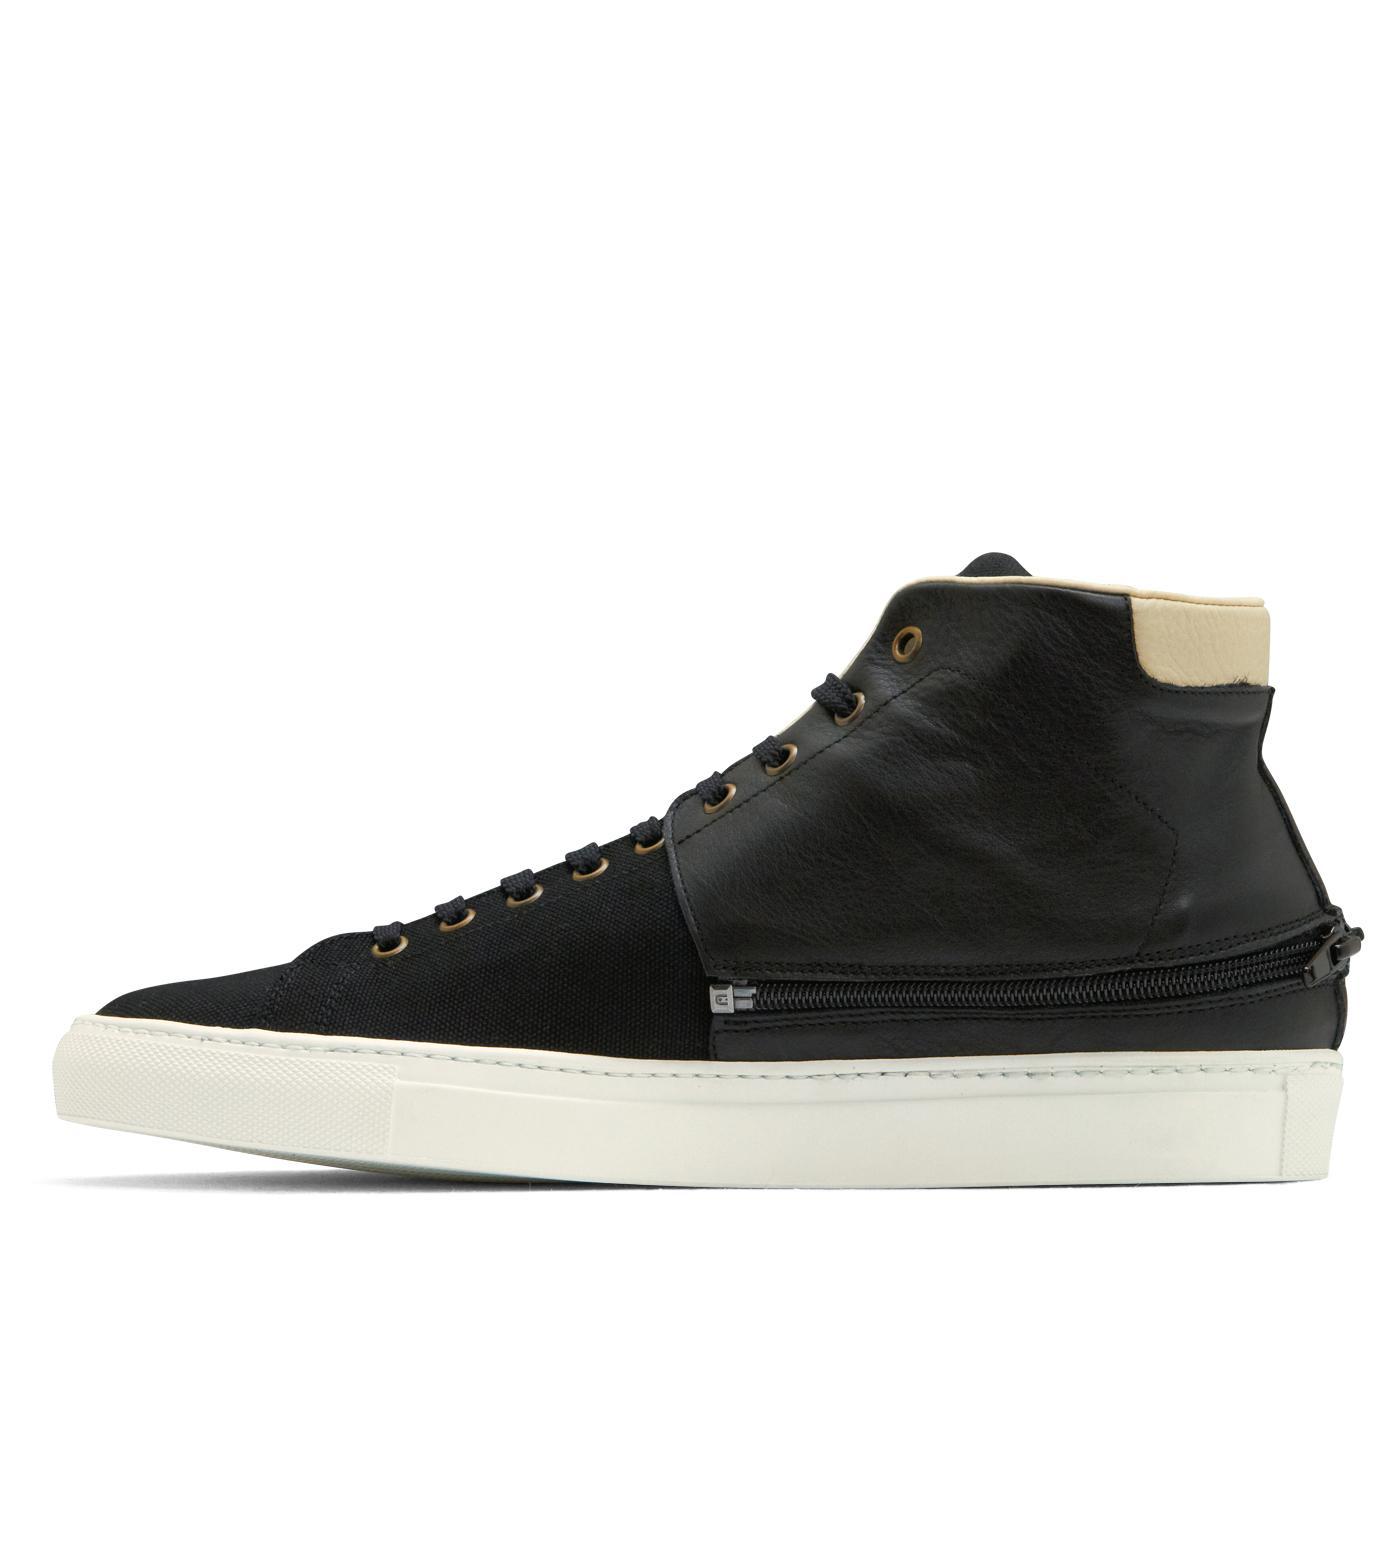 Trussardi(トラサルディ)のSeparate Sneaker-BLACK-1RS721-13 拡大詳細画像2